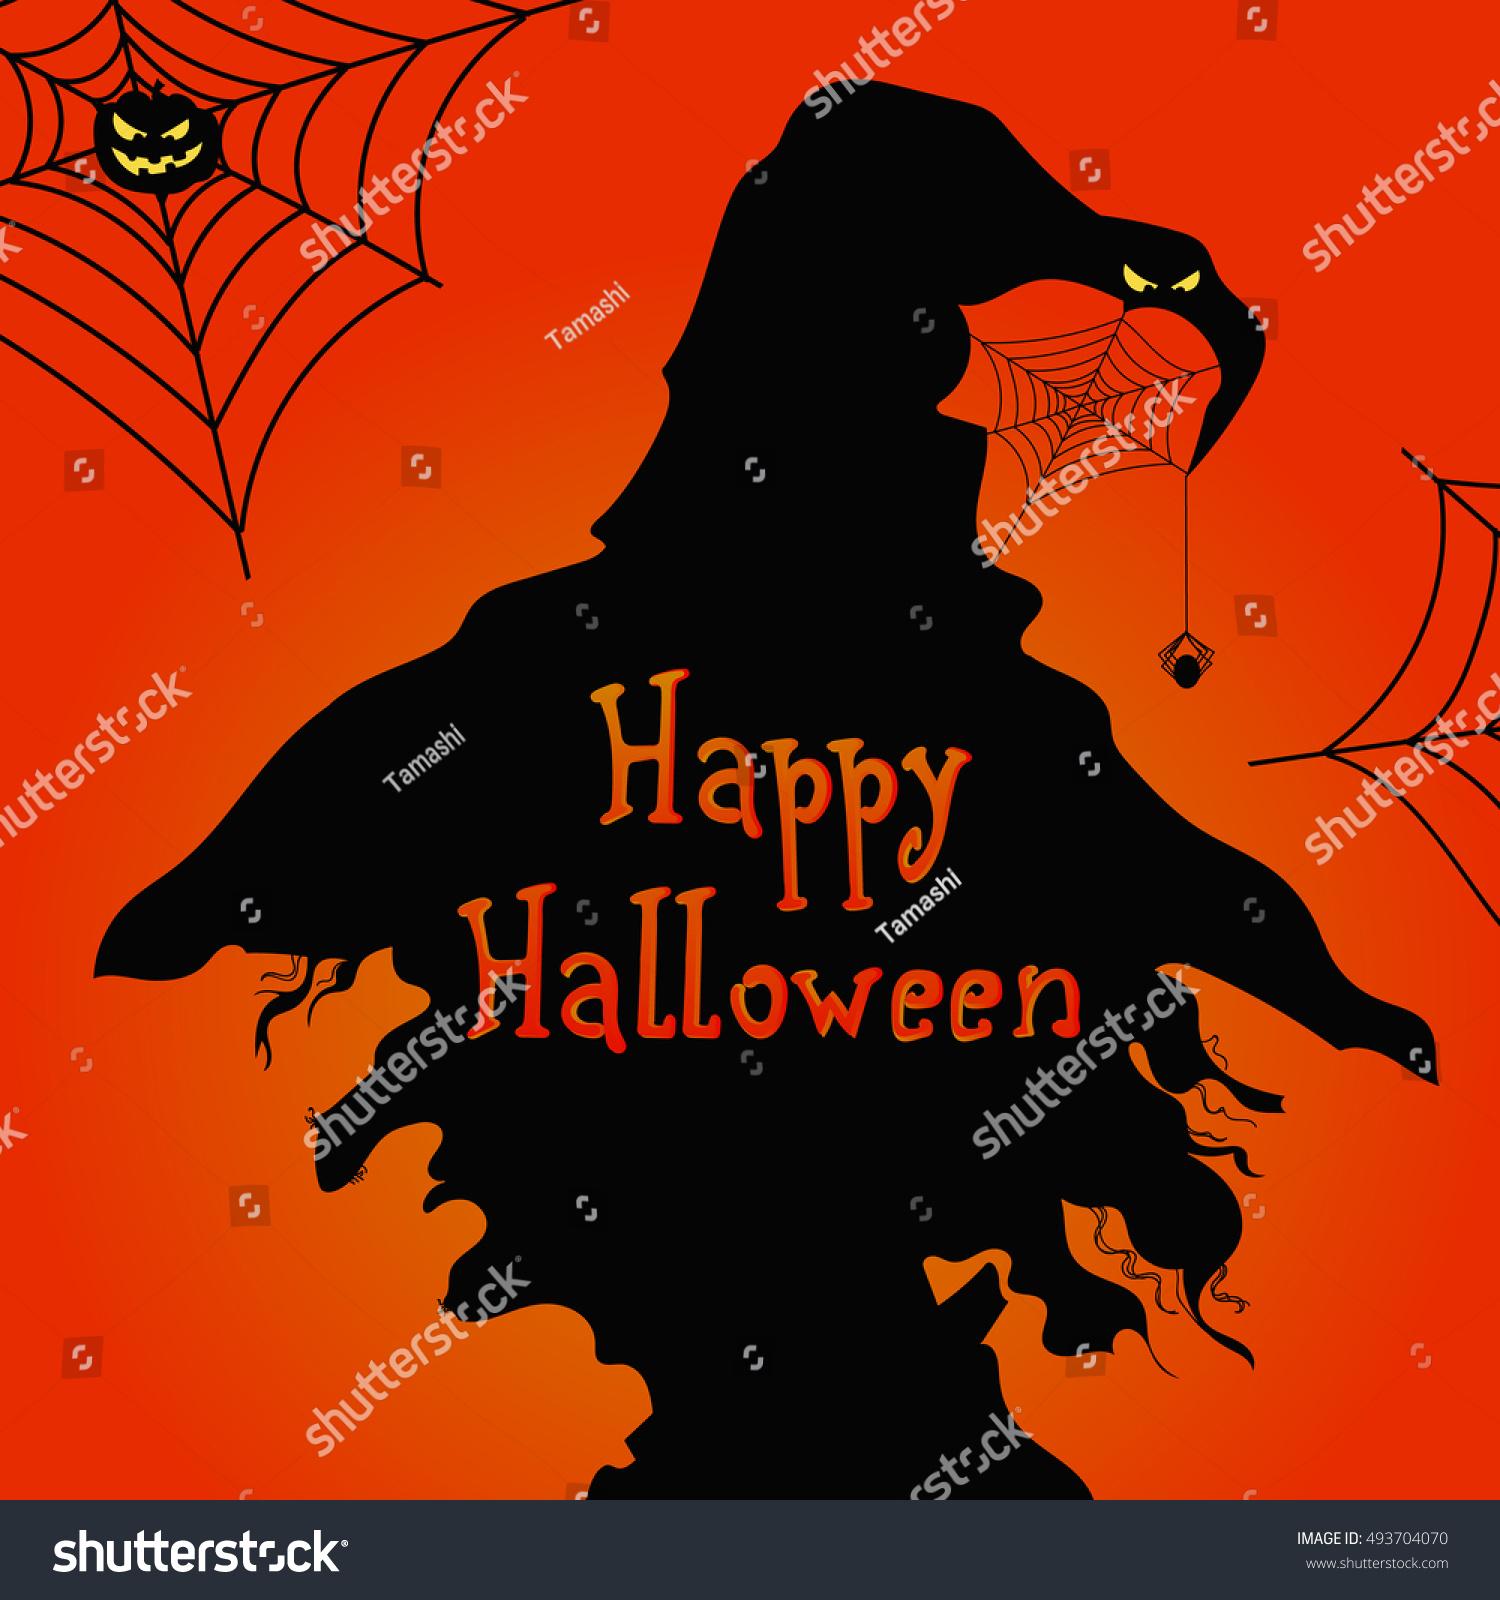 happy halloween vector image profile witch stock vector 493704070 - Chrispy Halloween